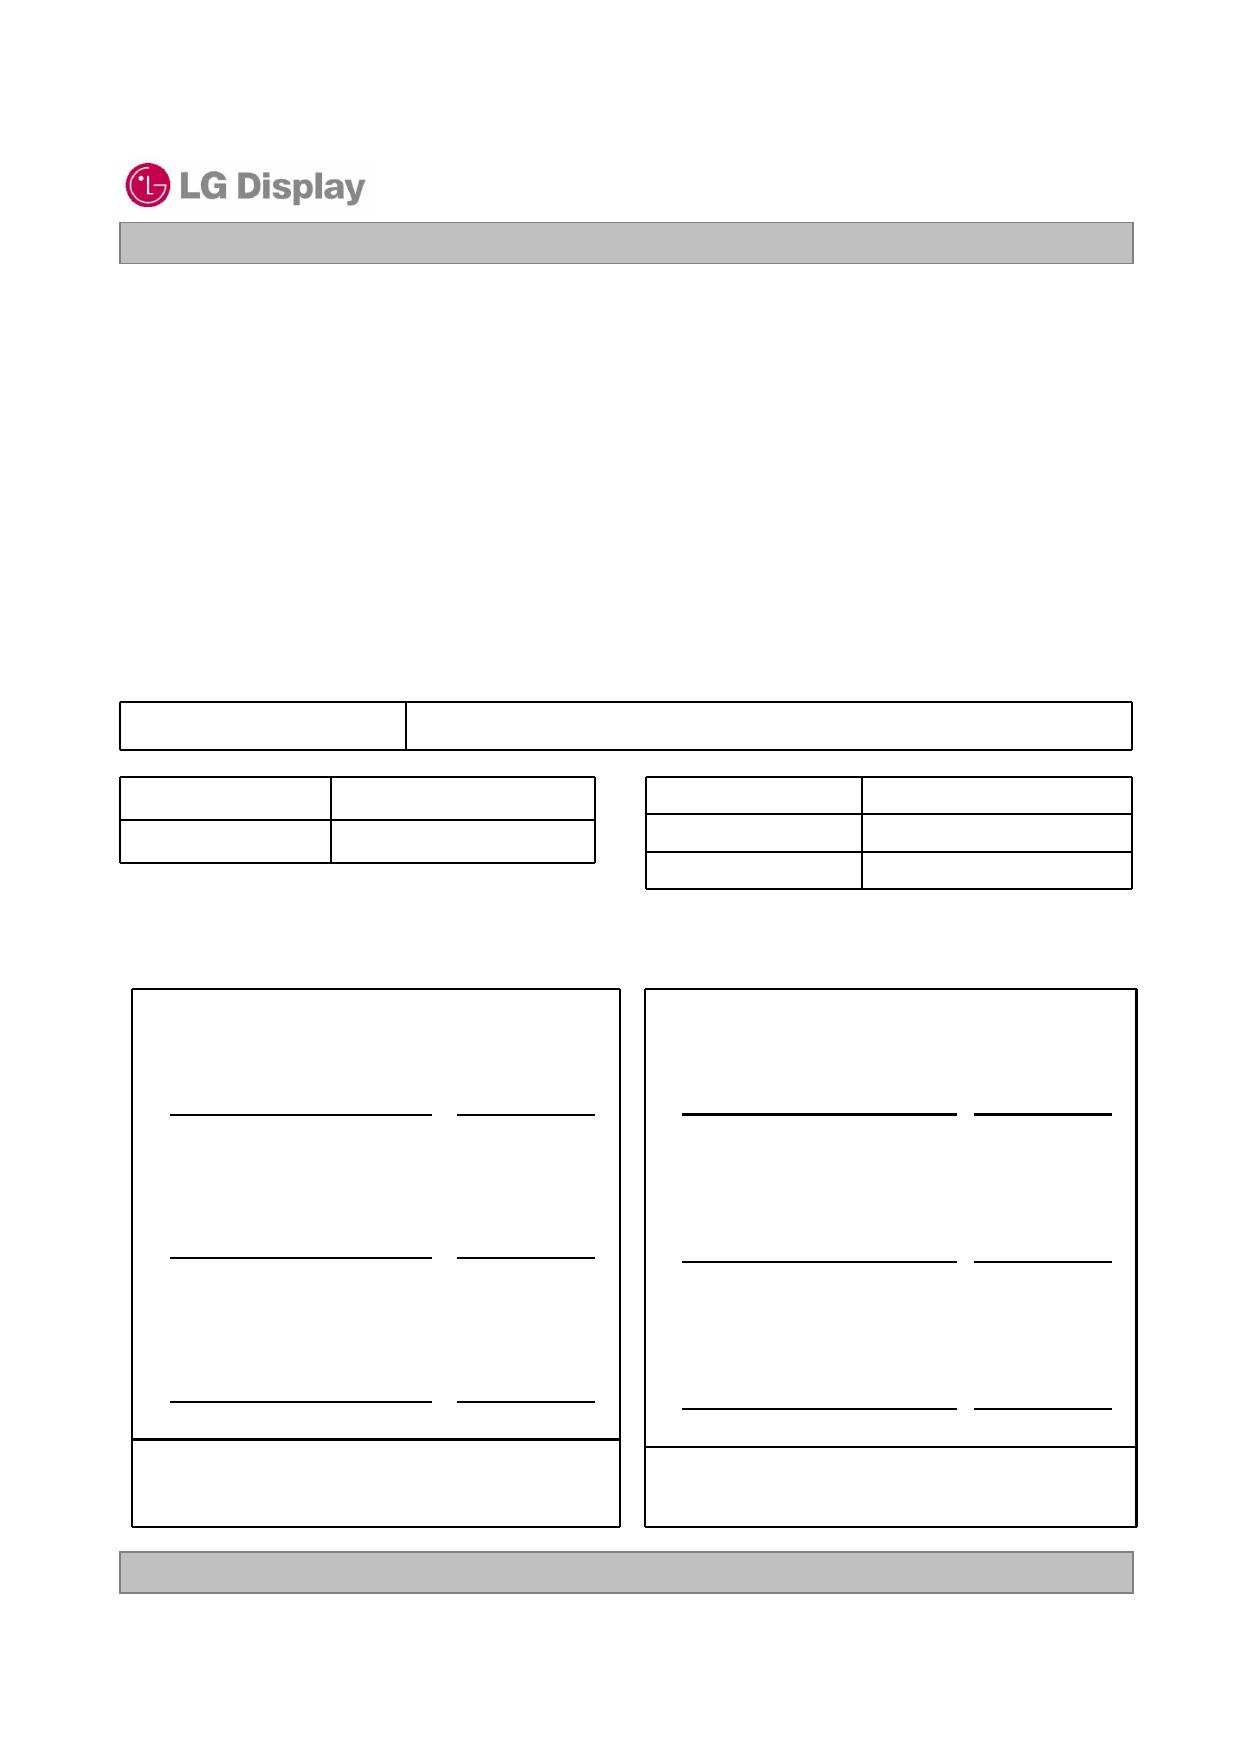 LC320EXN-SEA3 datasheet